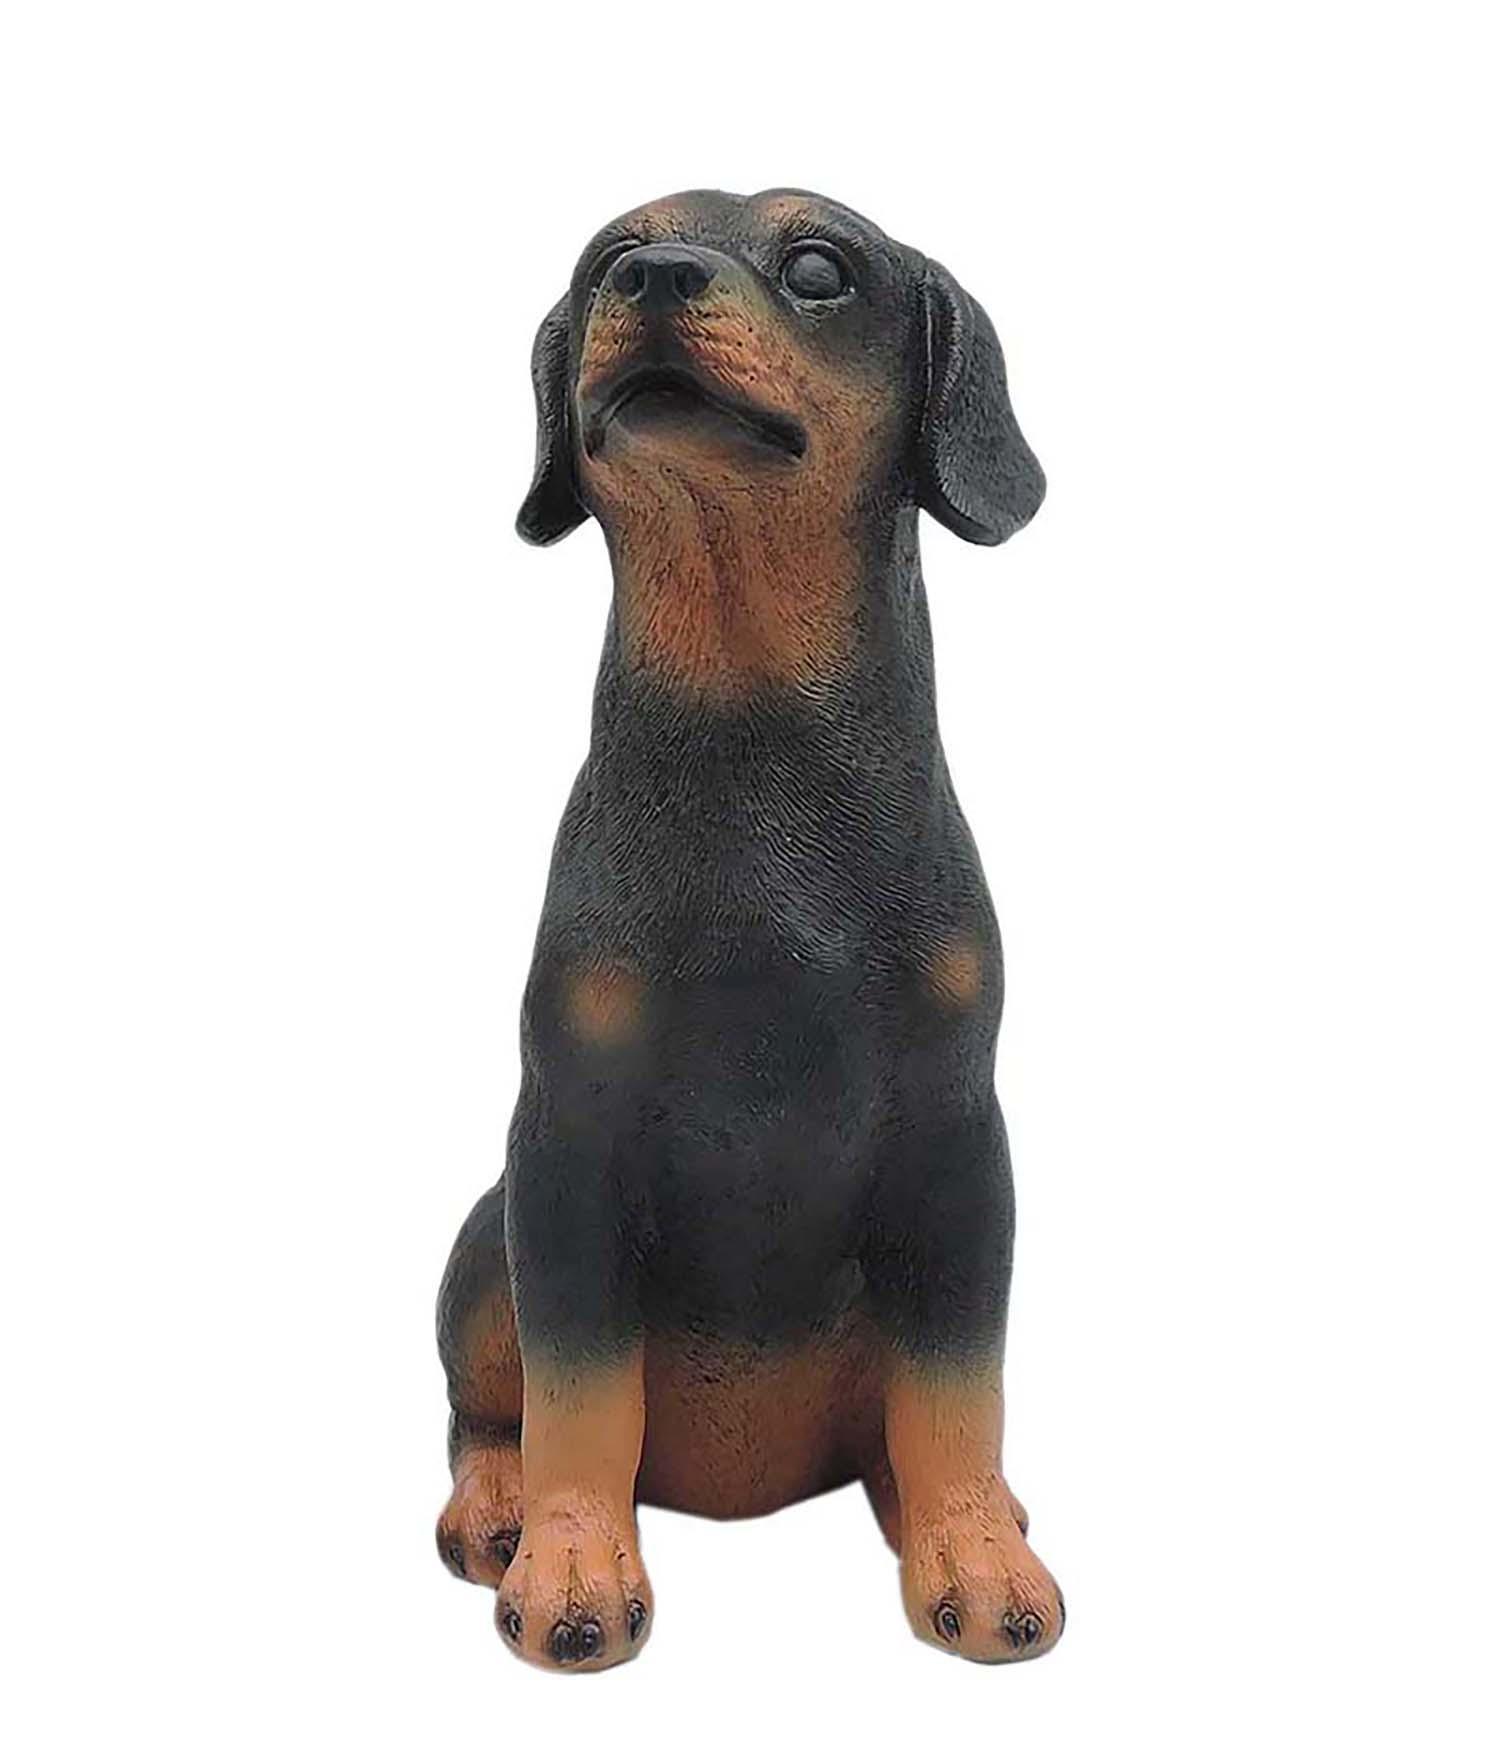 Cute Resin Black Dog  Great Choice for Garden Ornamnet PH15808